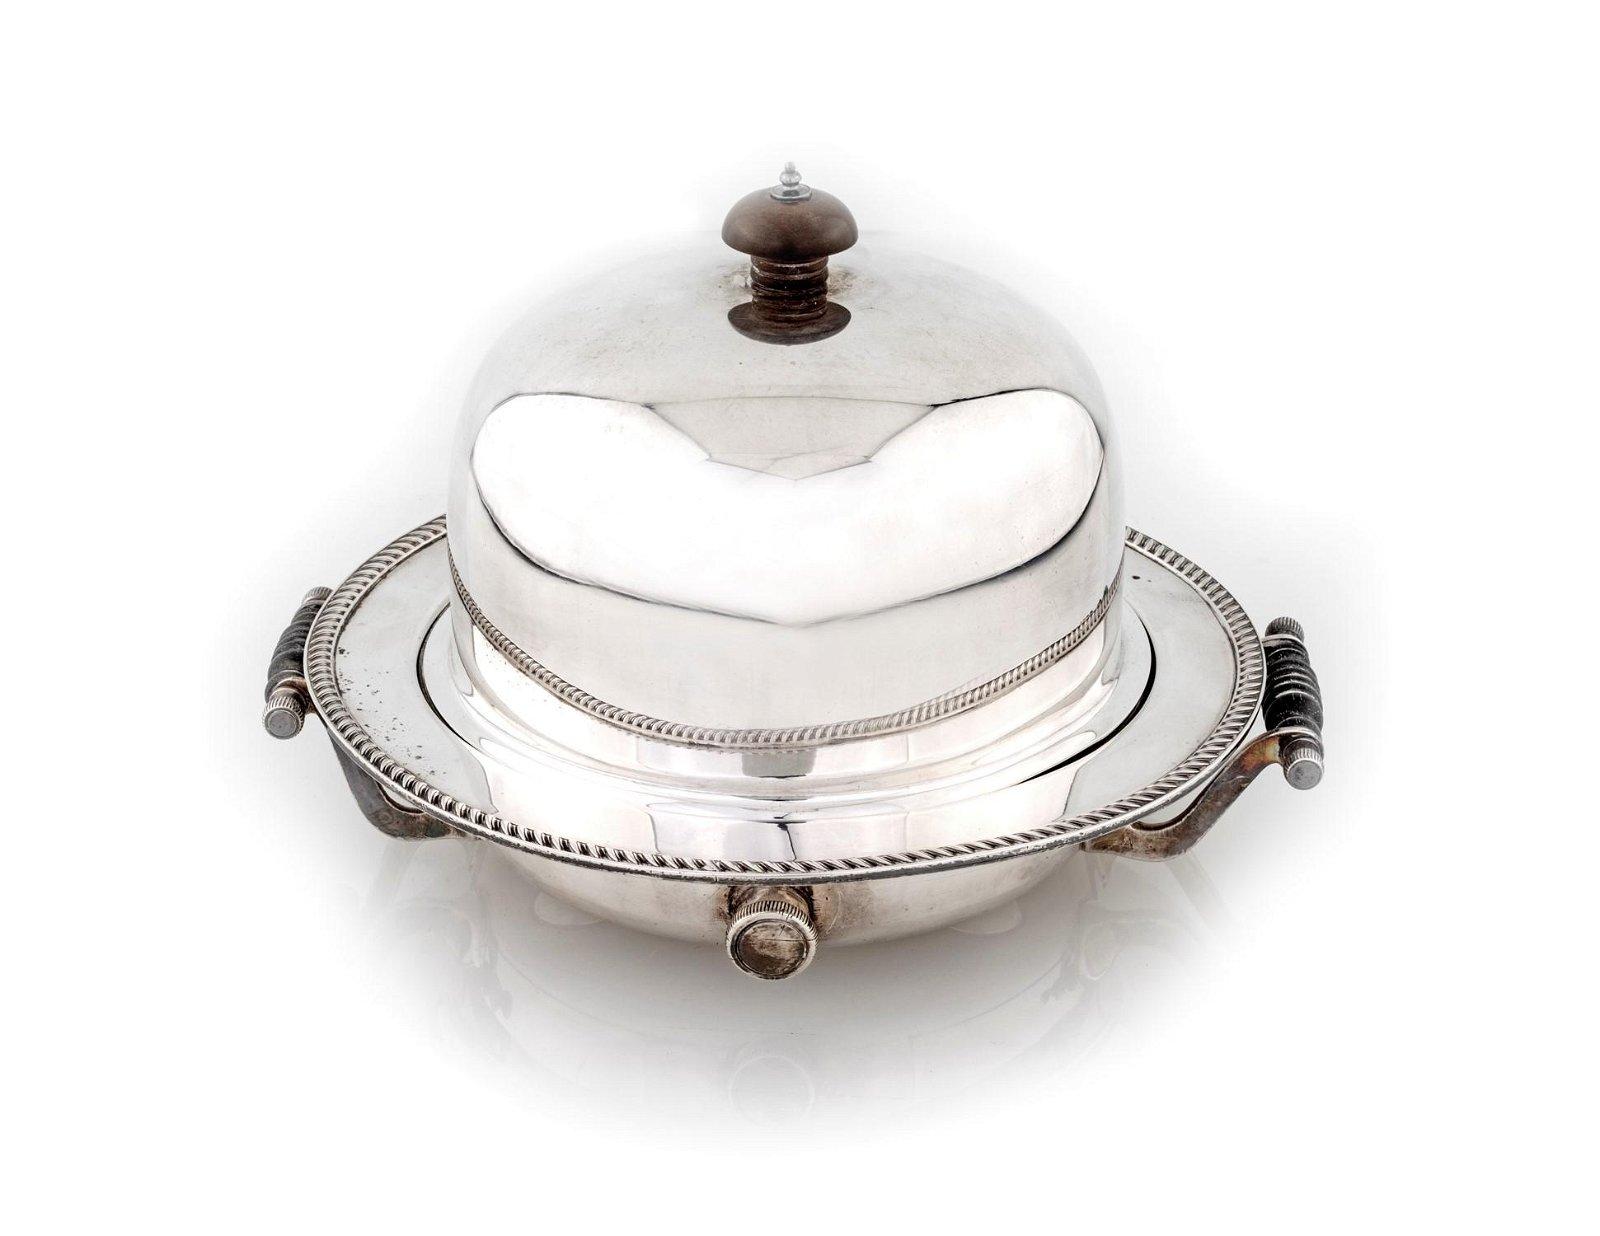 Silver metal chafing dish